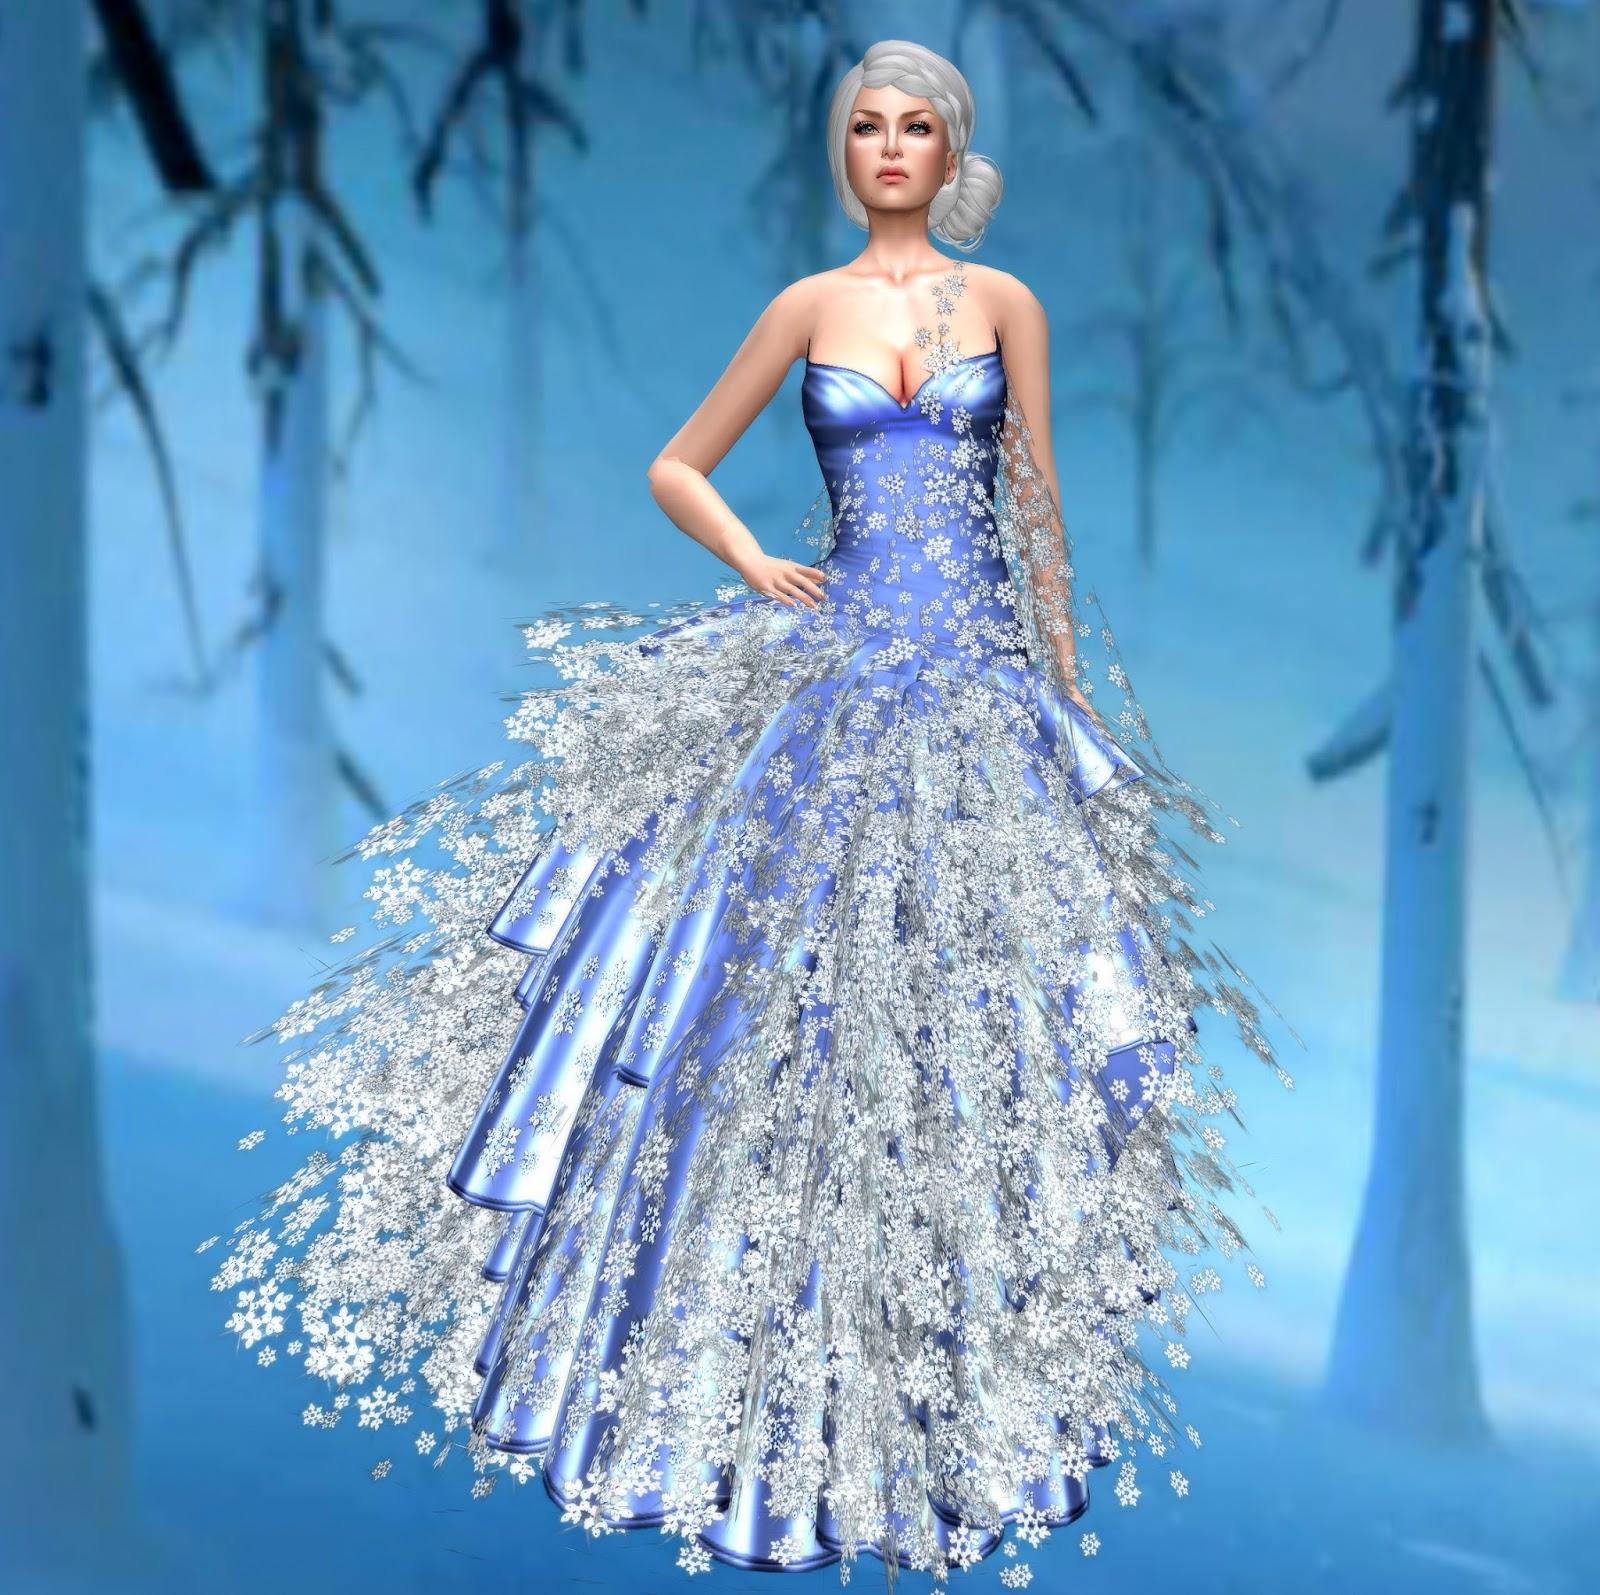 Bettinas Closet December 2013 Snow Flakes Dress Saturday 28